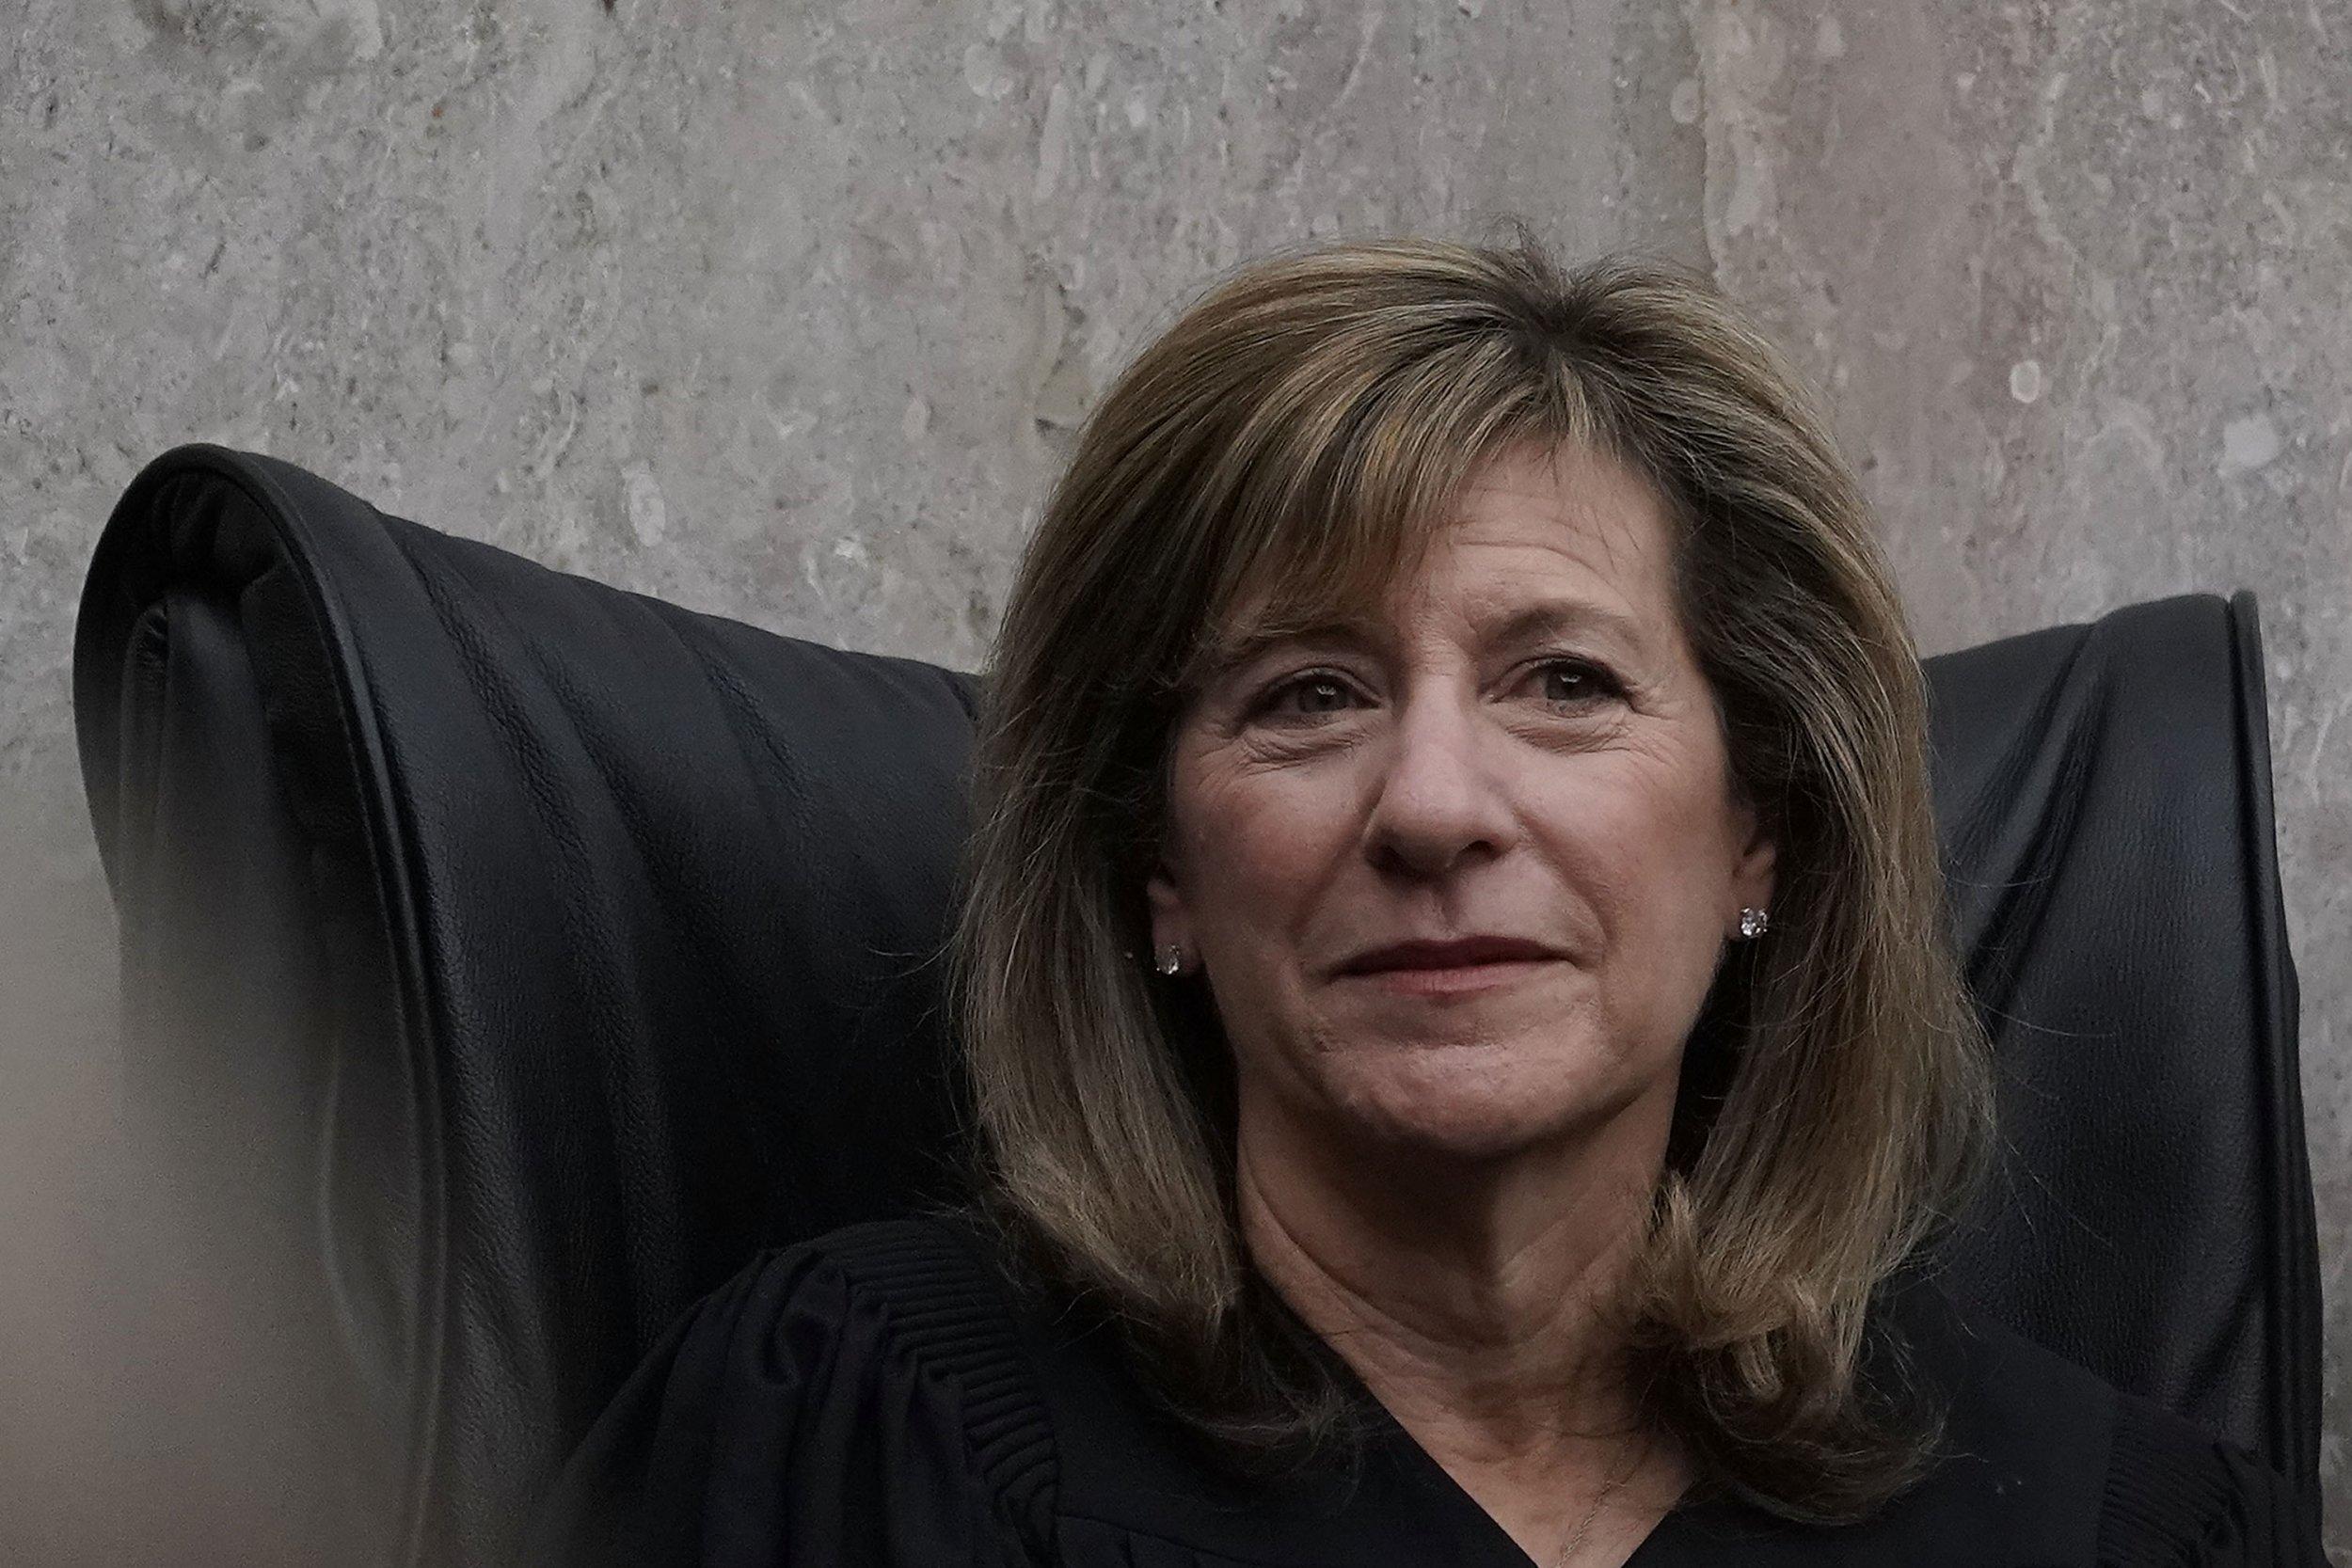 judge amy berman jackson, paul manafort sentence